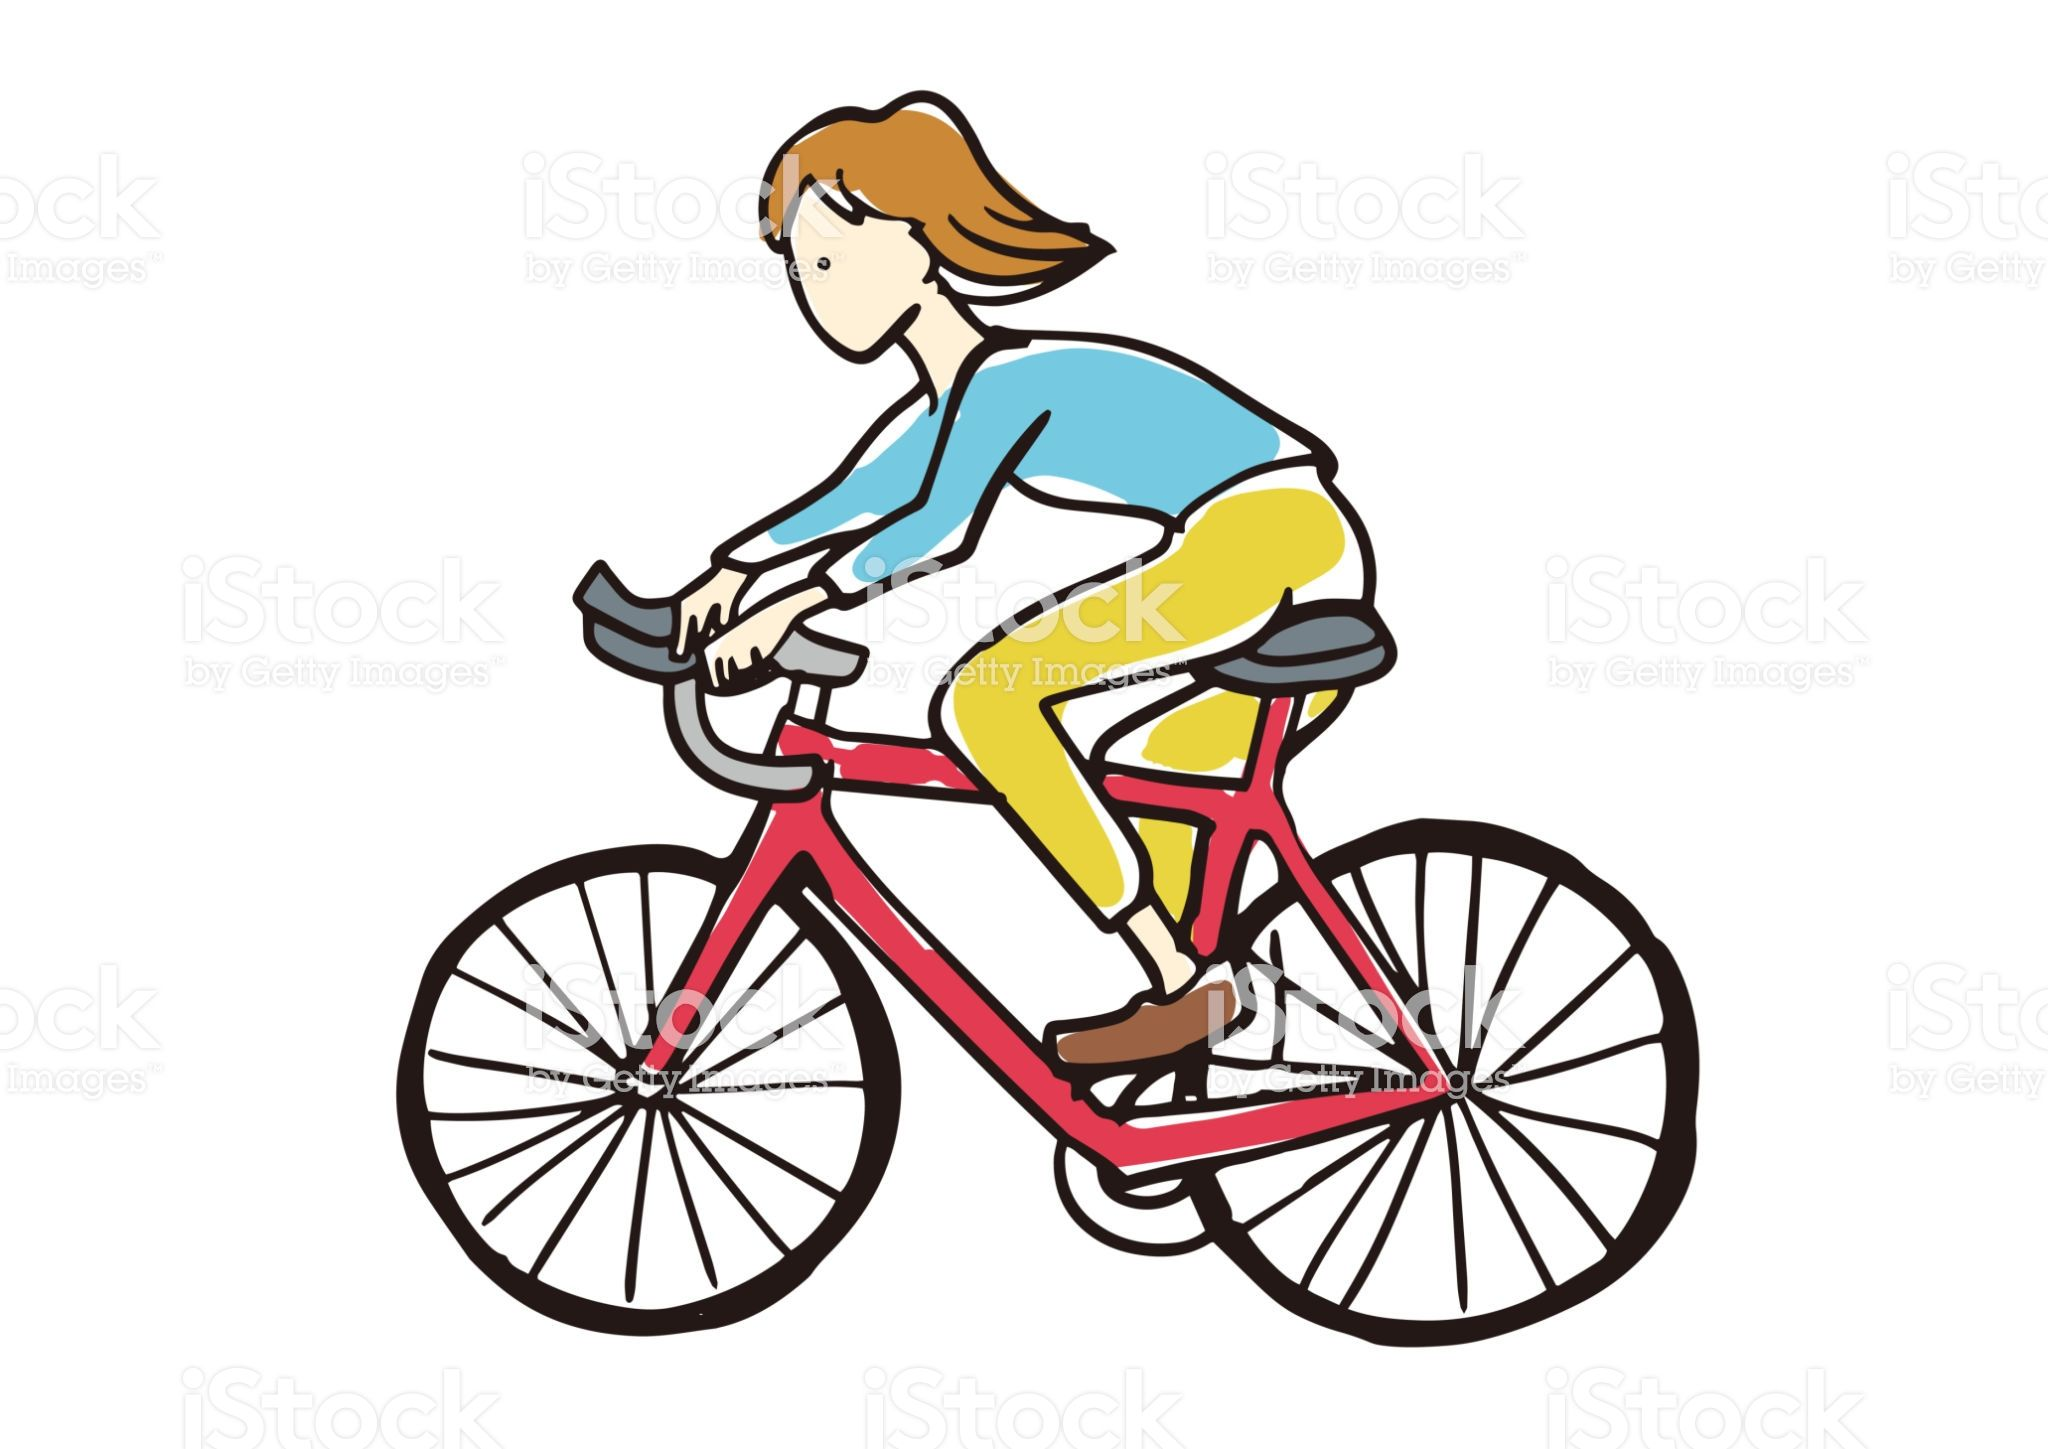 A Person Riding A Bicycle Diseno De Personajes Imagen De Alta Resolucion Andar En Bicicleta